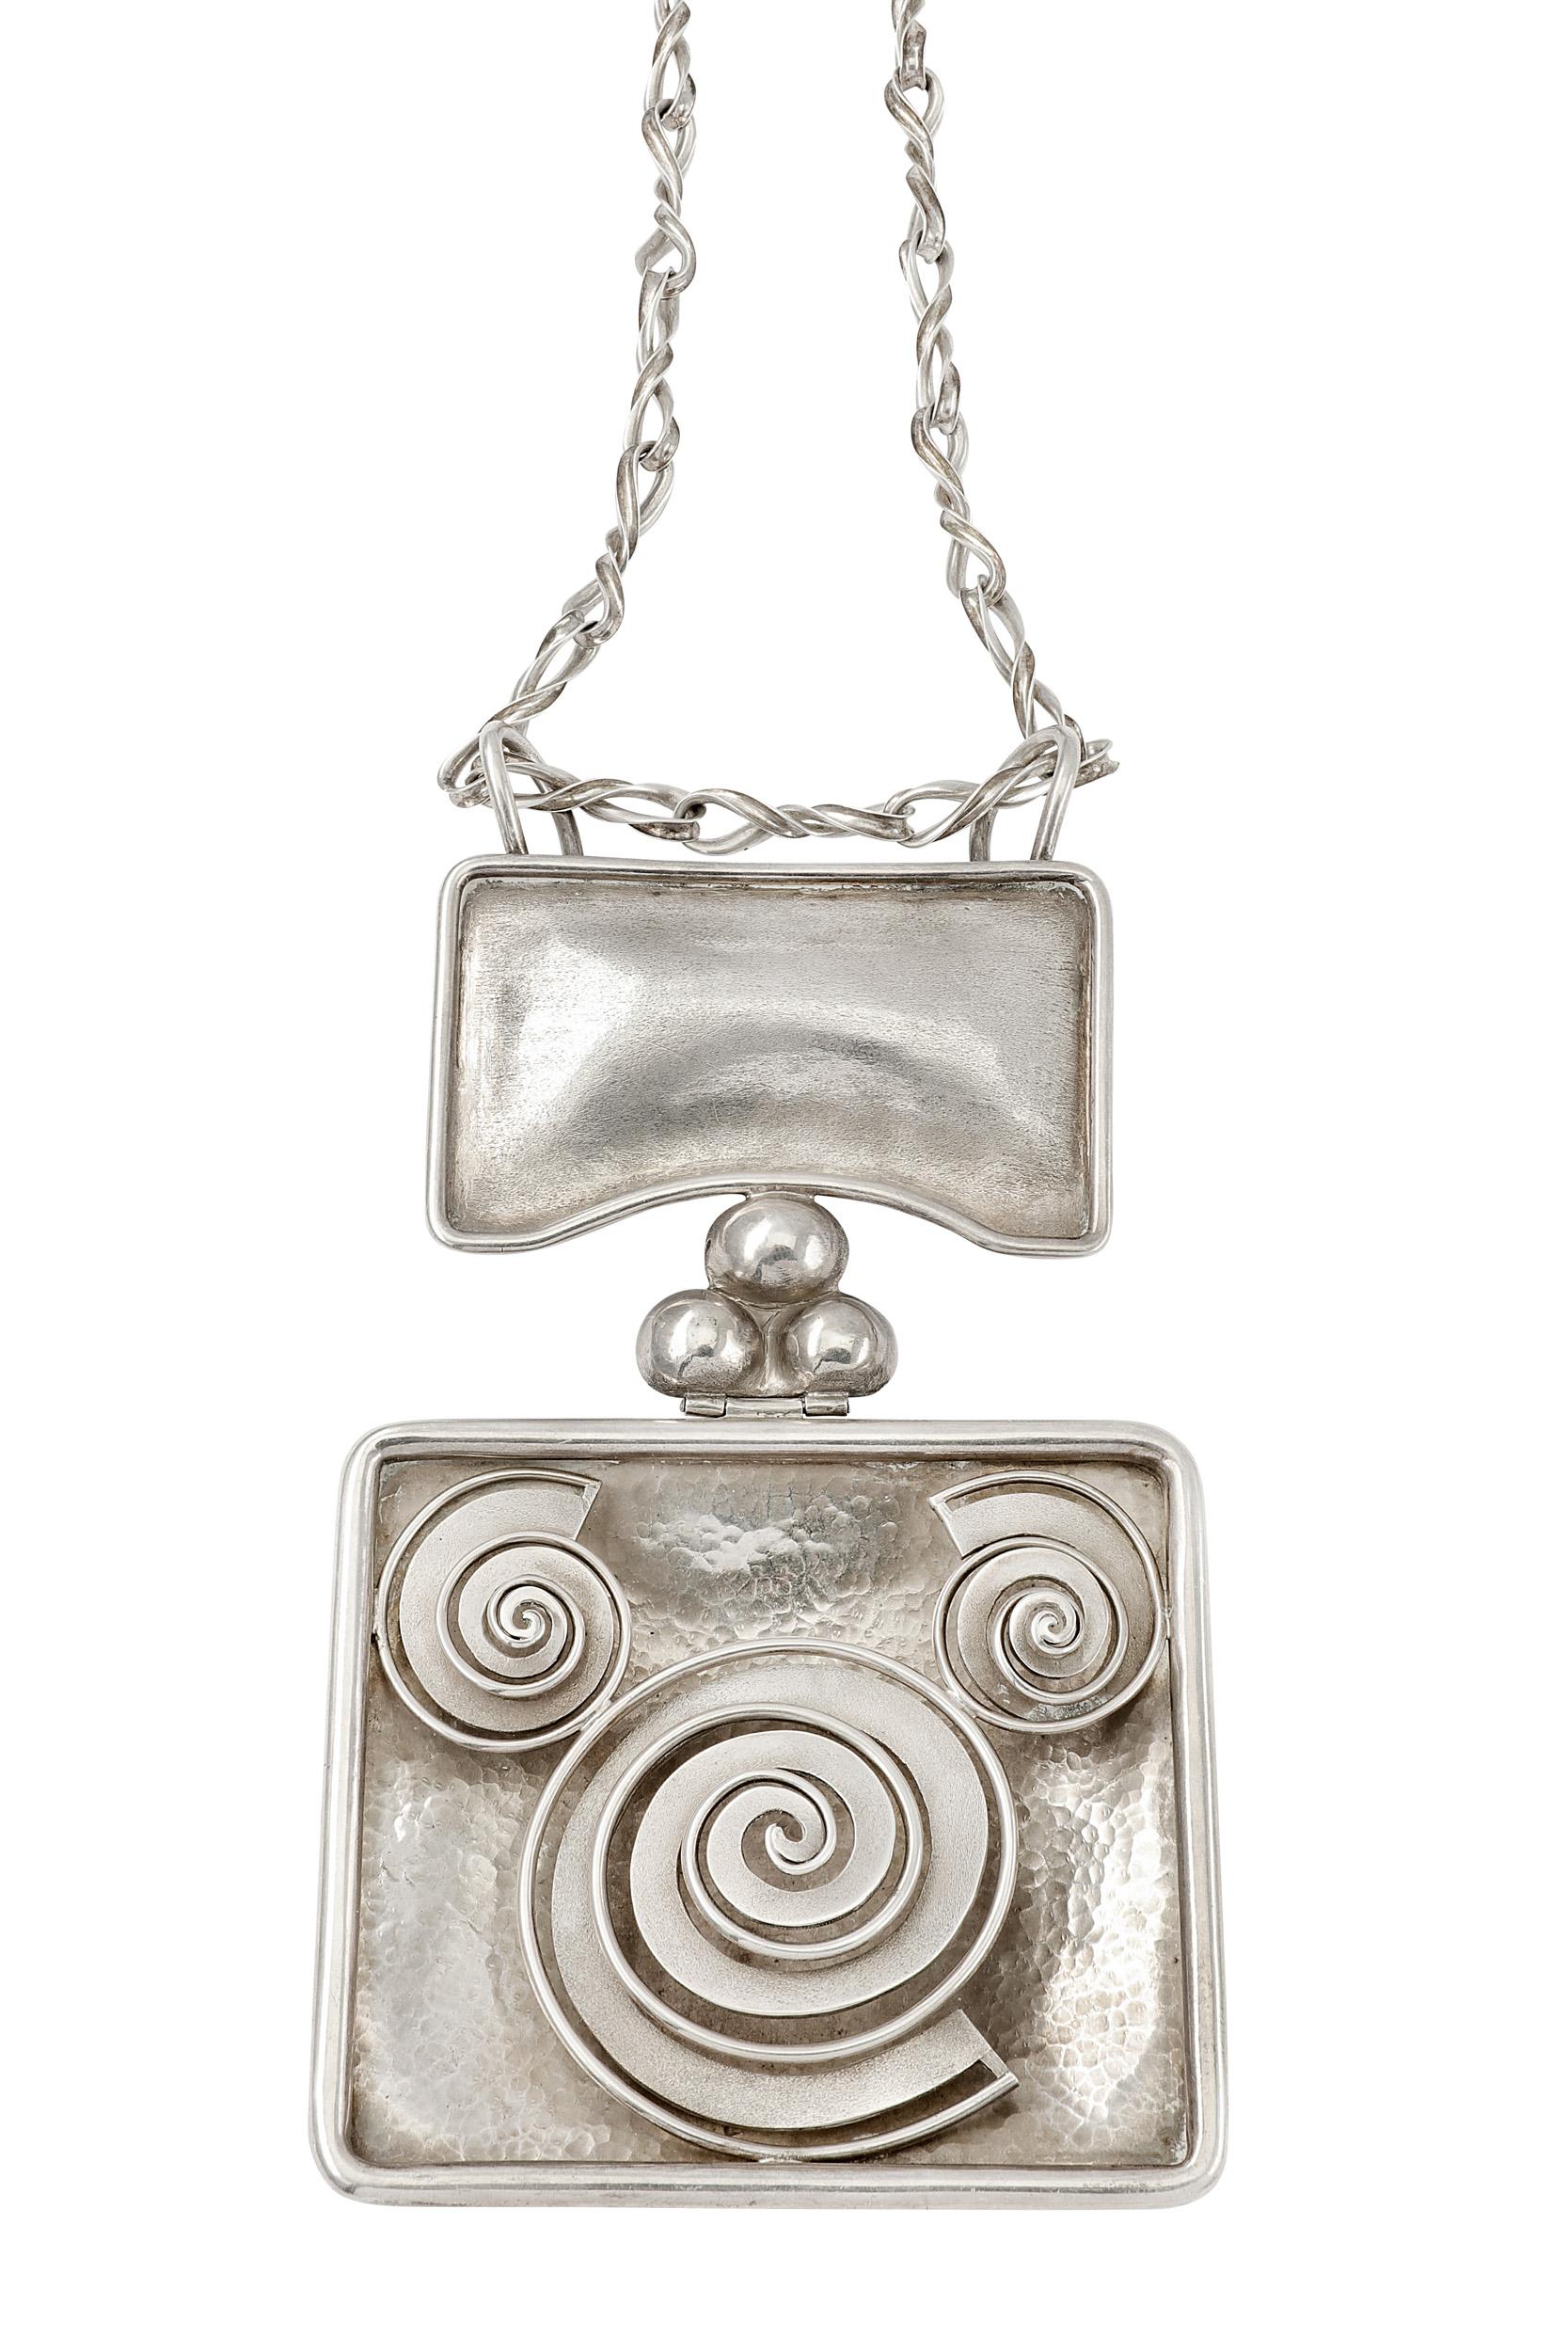 Lot 52 - A pendant, by Lalaounis, circa 1970